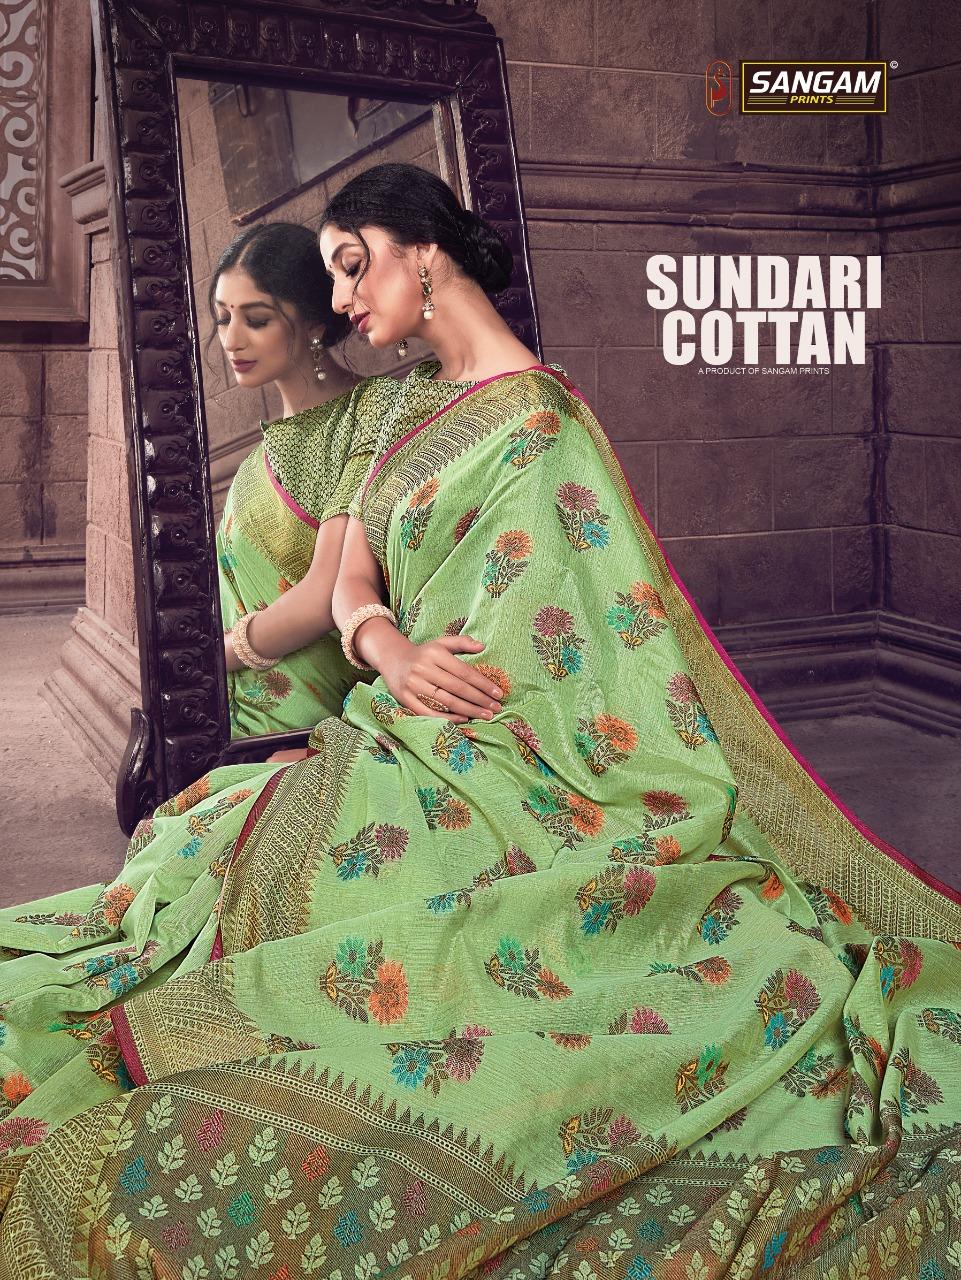 Sangam Prints Sundari Cotton Handloom Silk Exclusive Collections For Saree